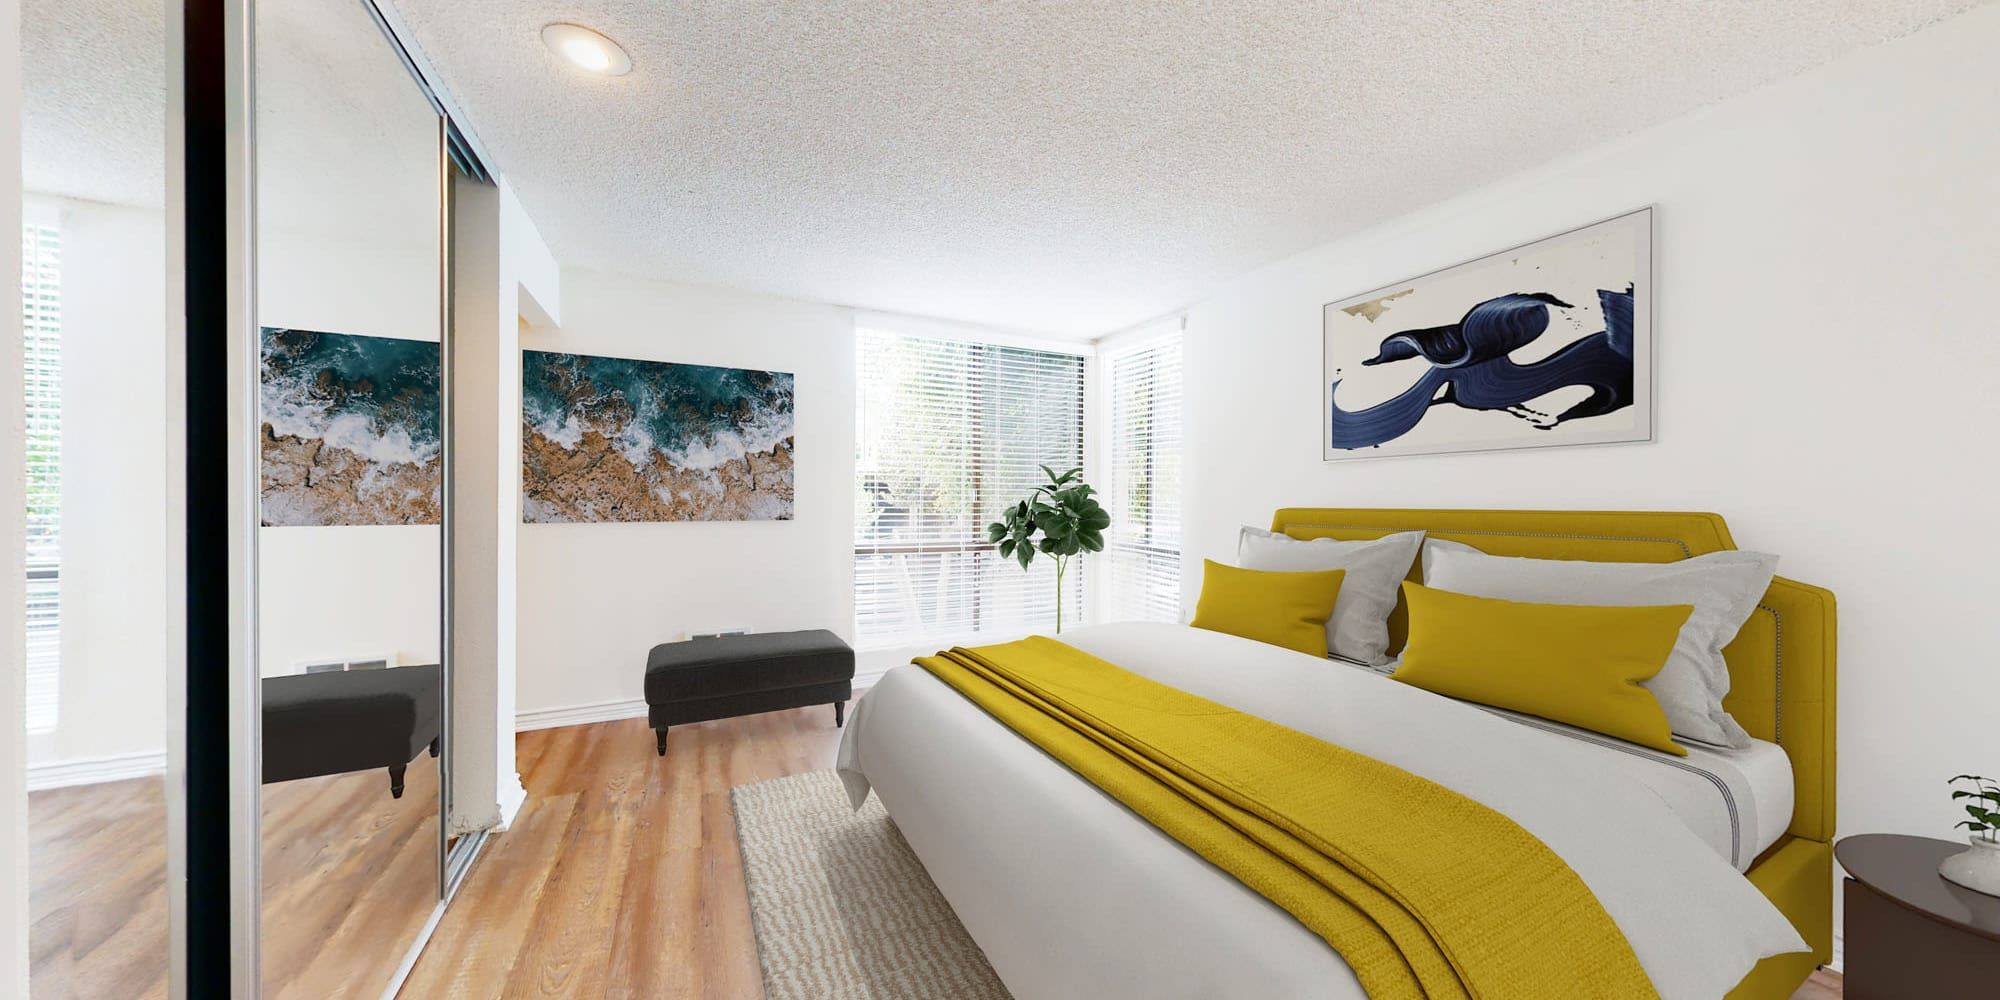 Hardwood flooring and mirrored closet doors in a model apartment's bedroom at Mariners Village in Marina del Rey, California